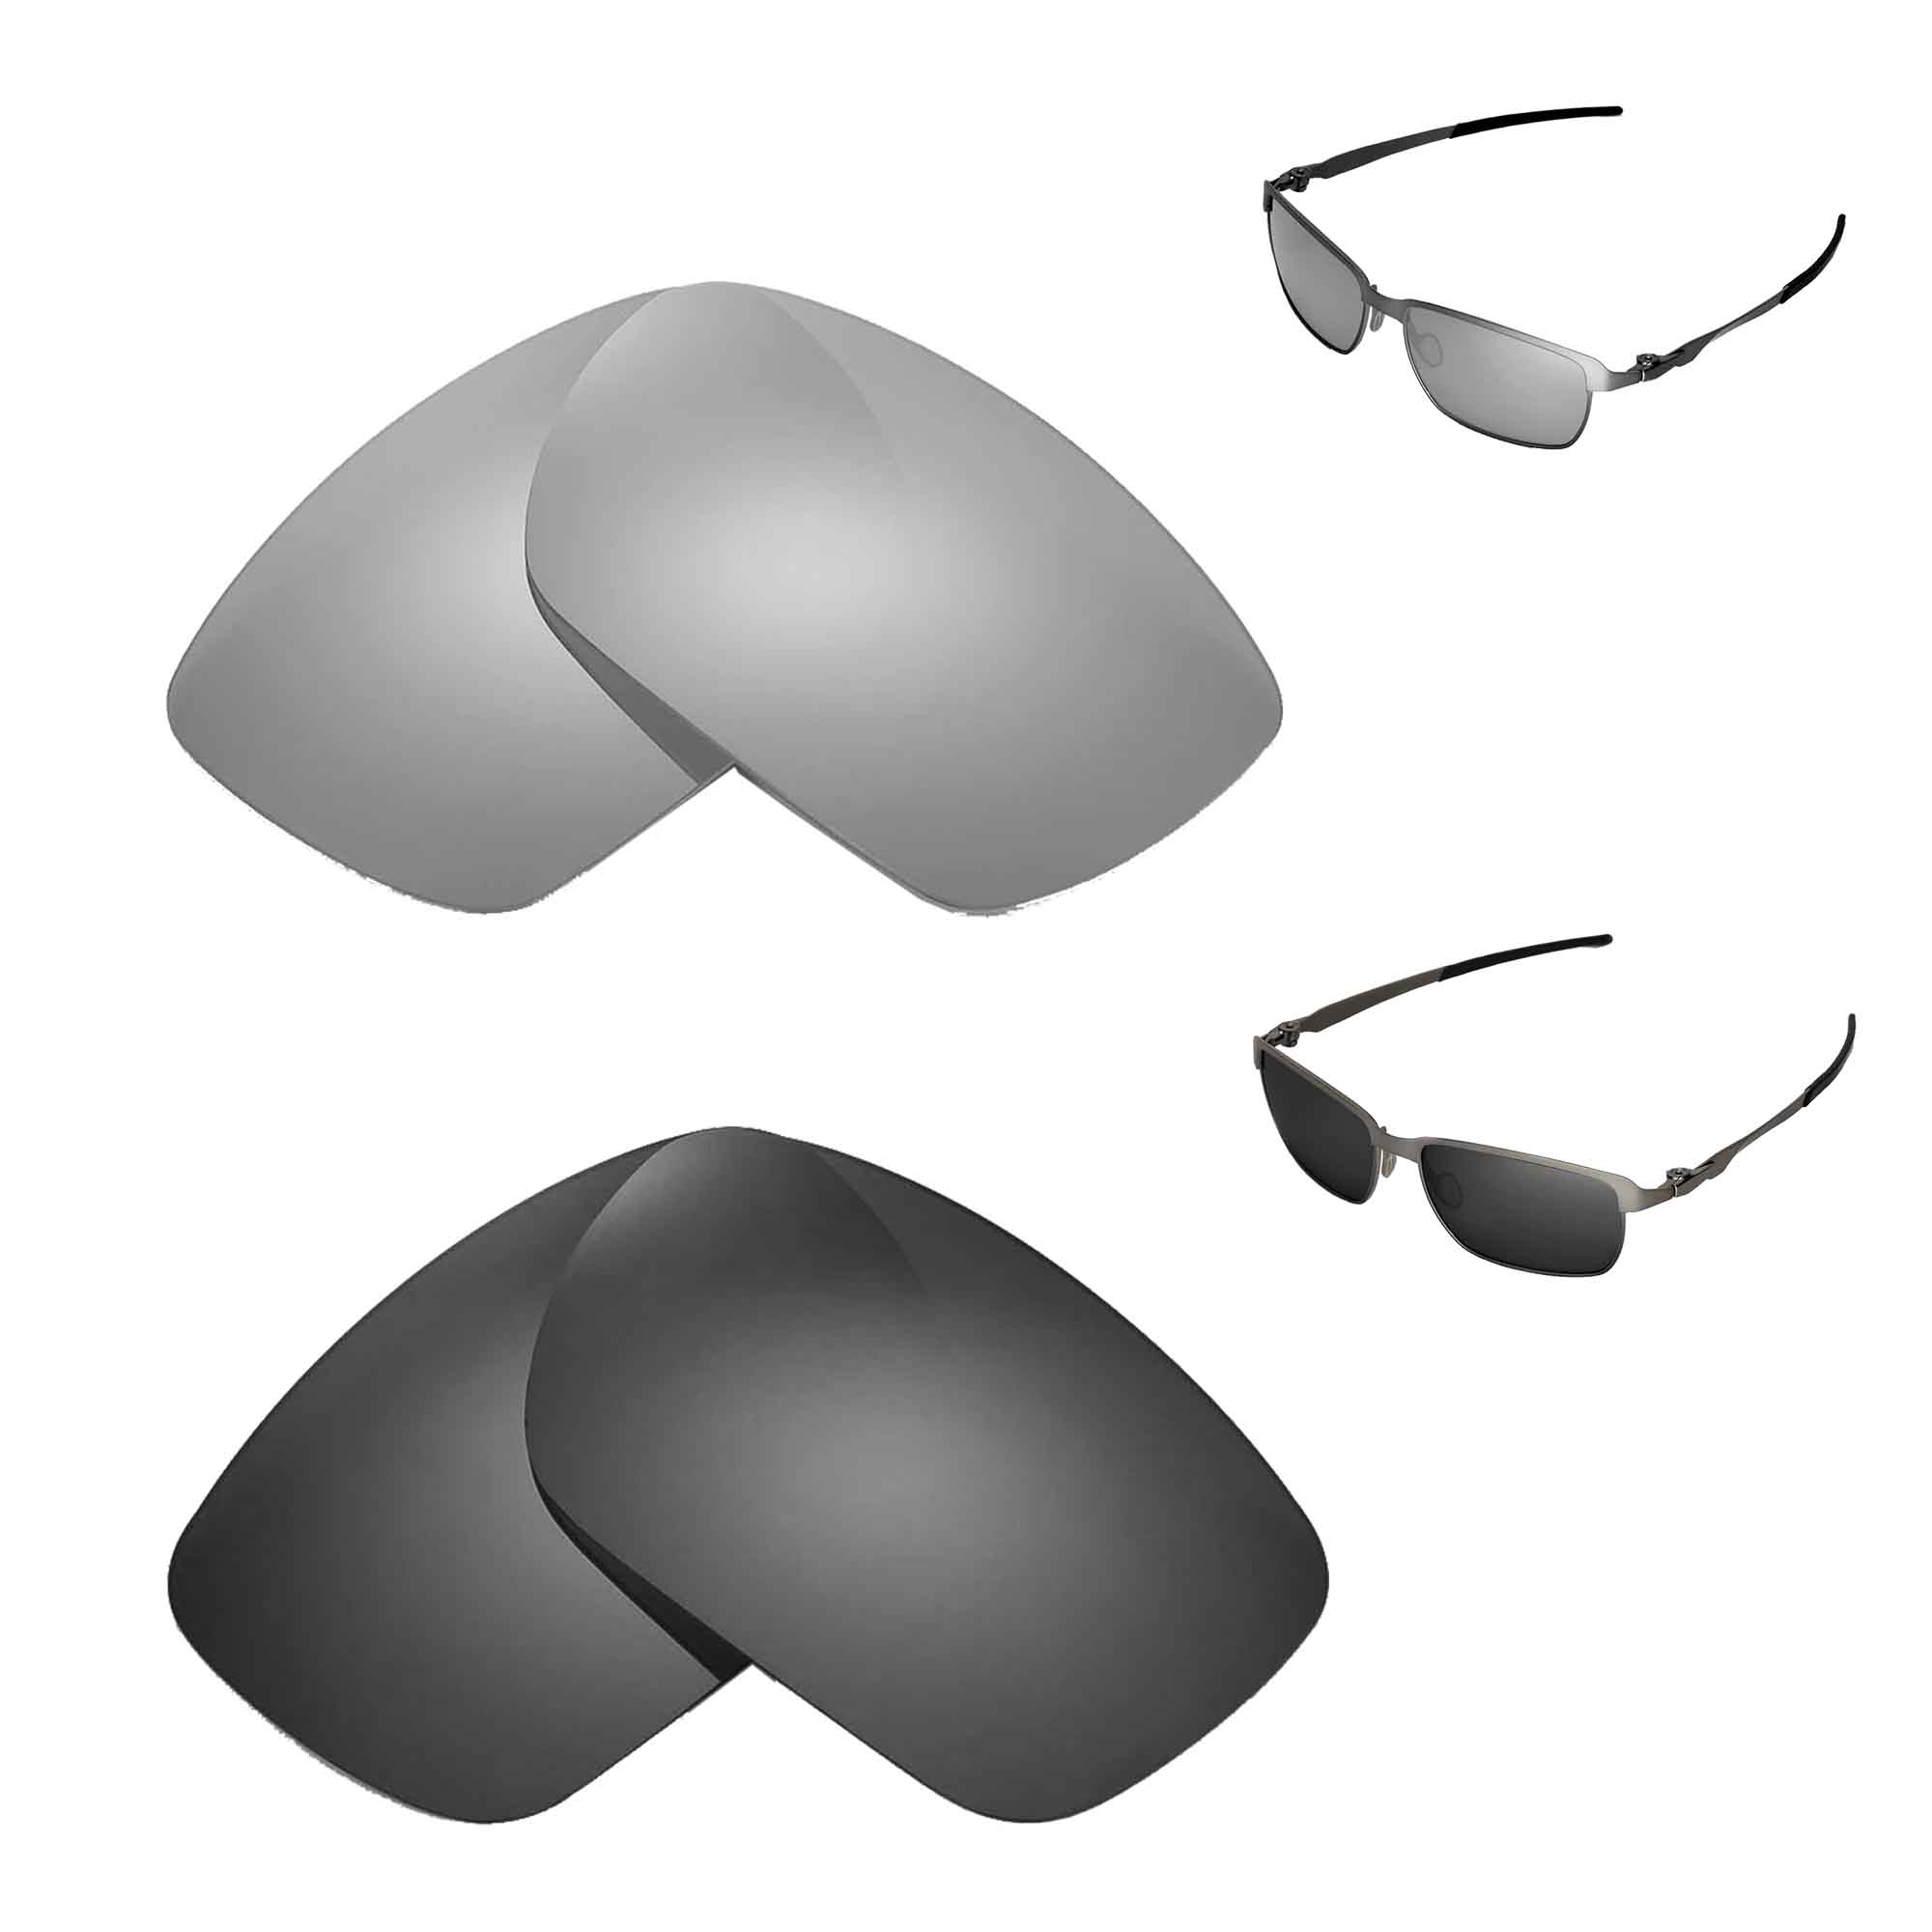 598ce1a34e Details about New Walleva Titanium + Black Polarized Replacement Lenses For  Oakley Tinfoil